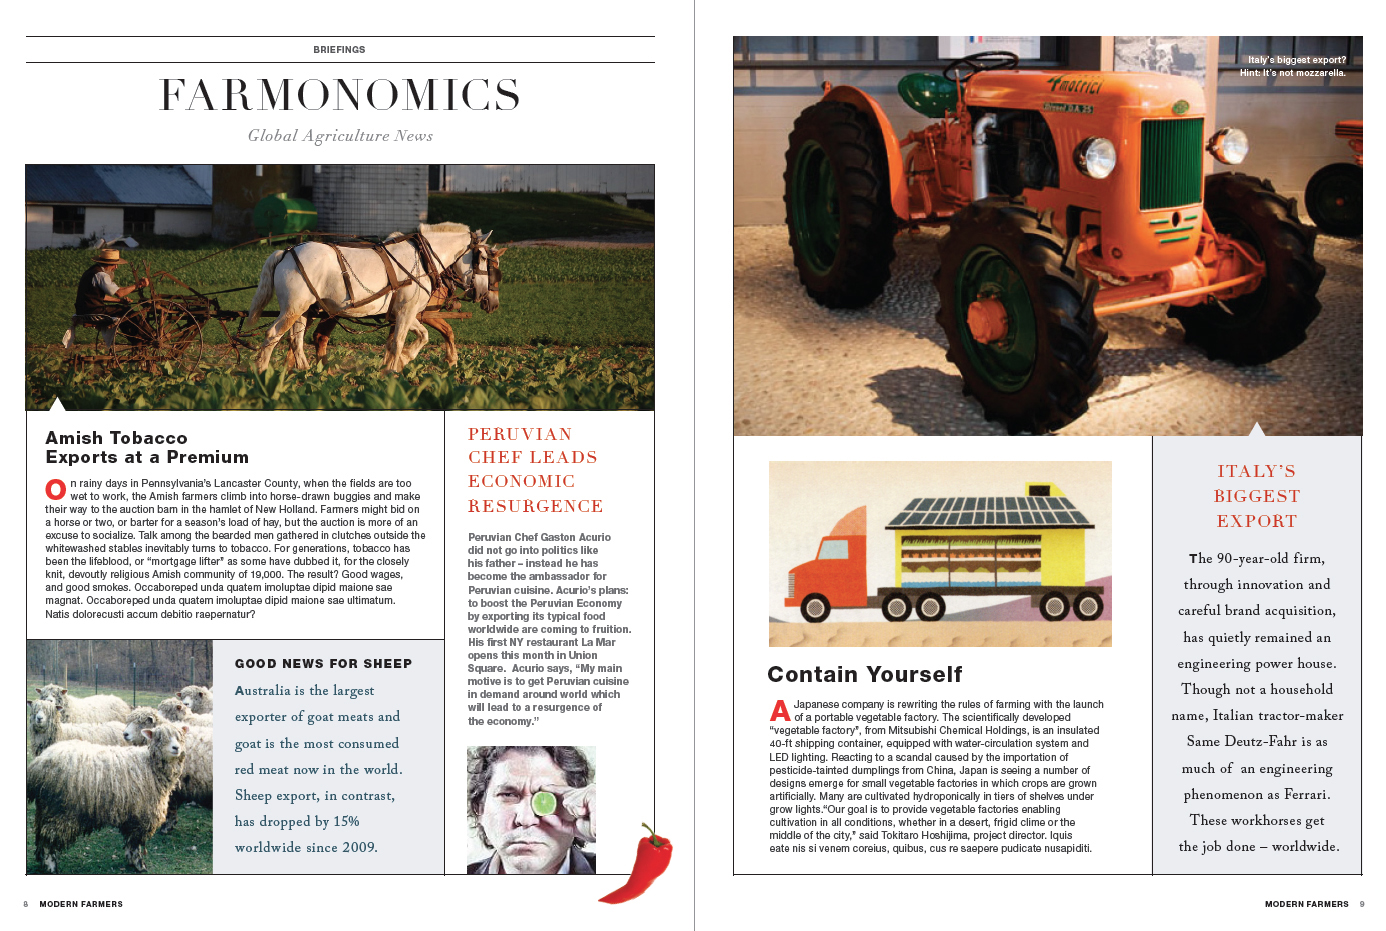 Modern Farmer Prototype Magazine Design  Farmonomics 2